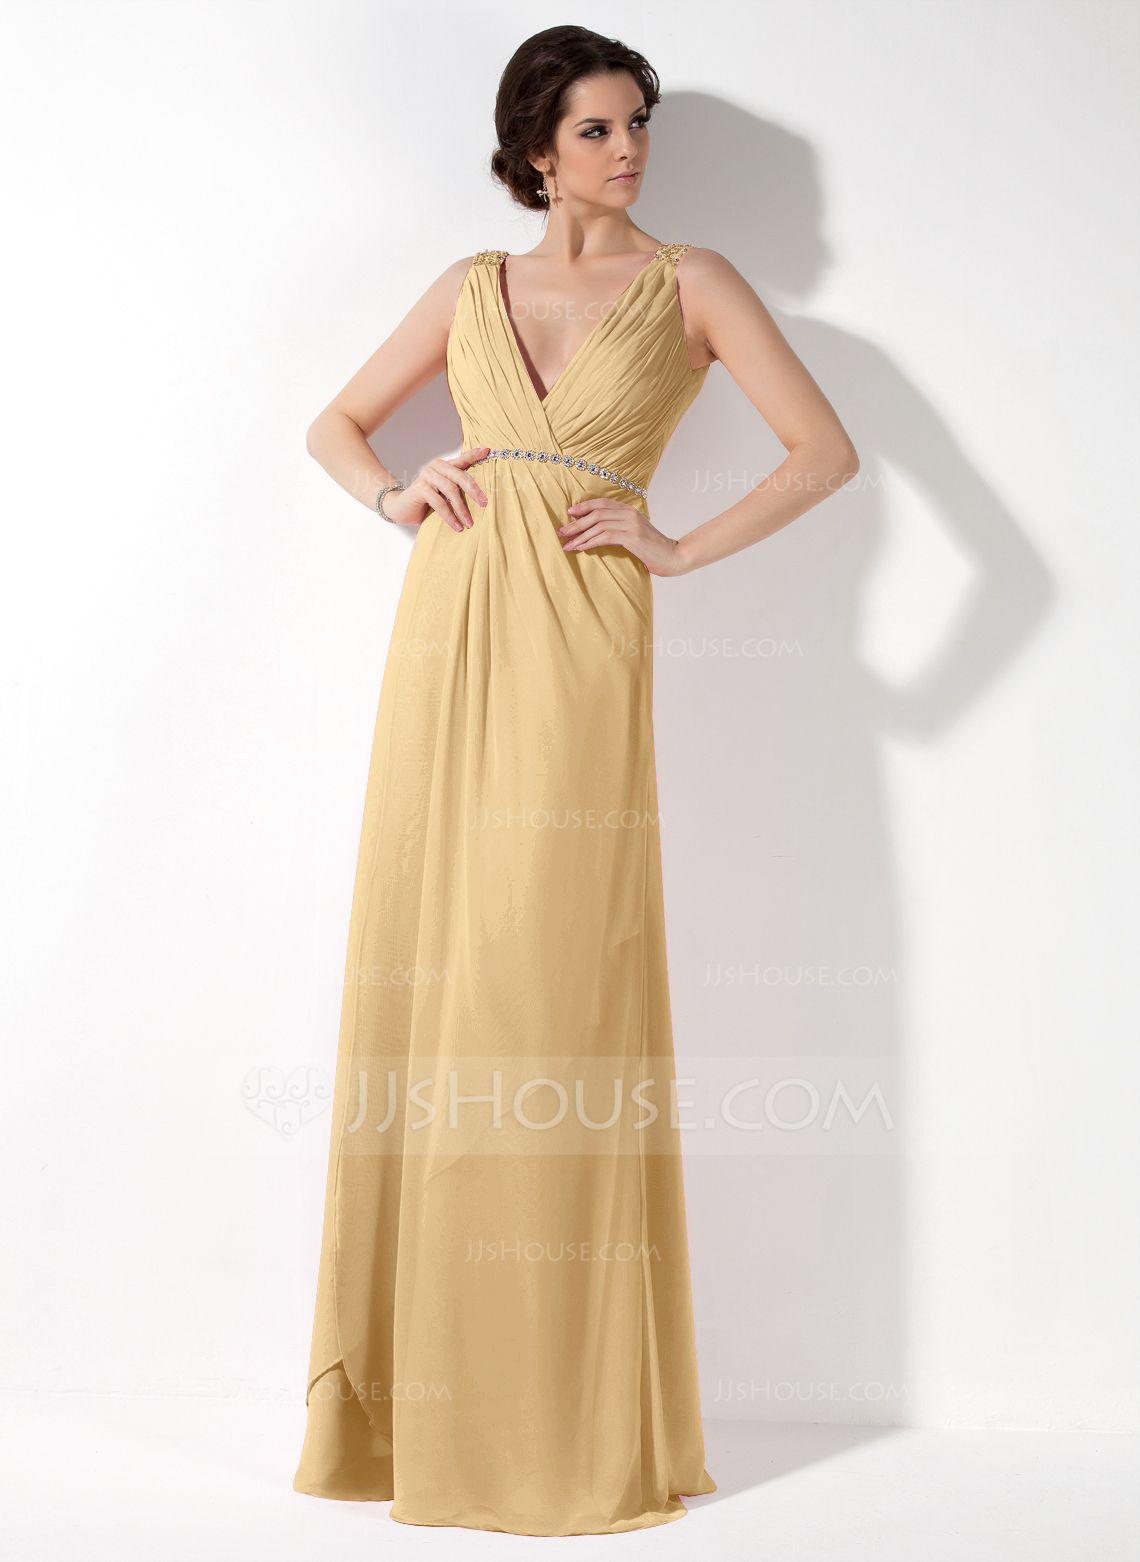 Alineprincess vneck floorlength chiffon bridesmaid dress with